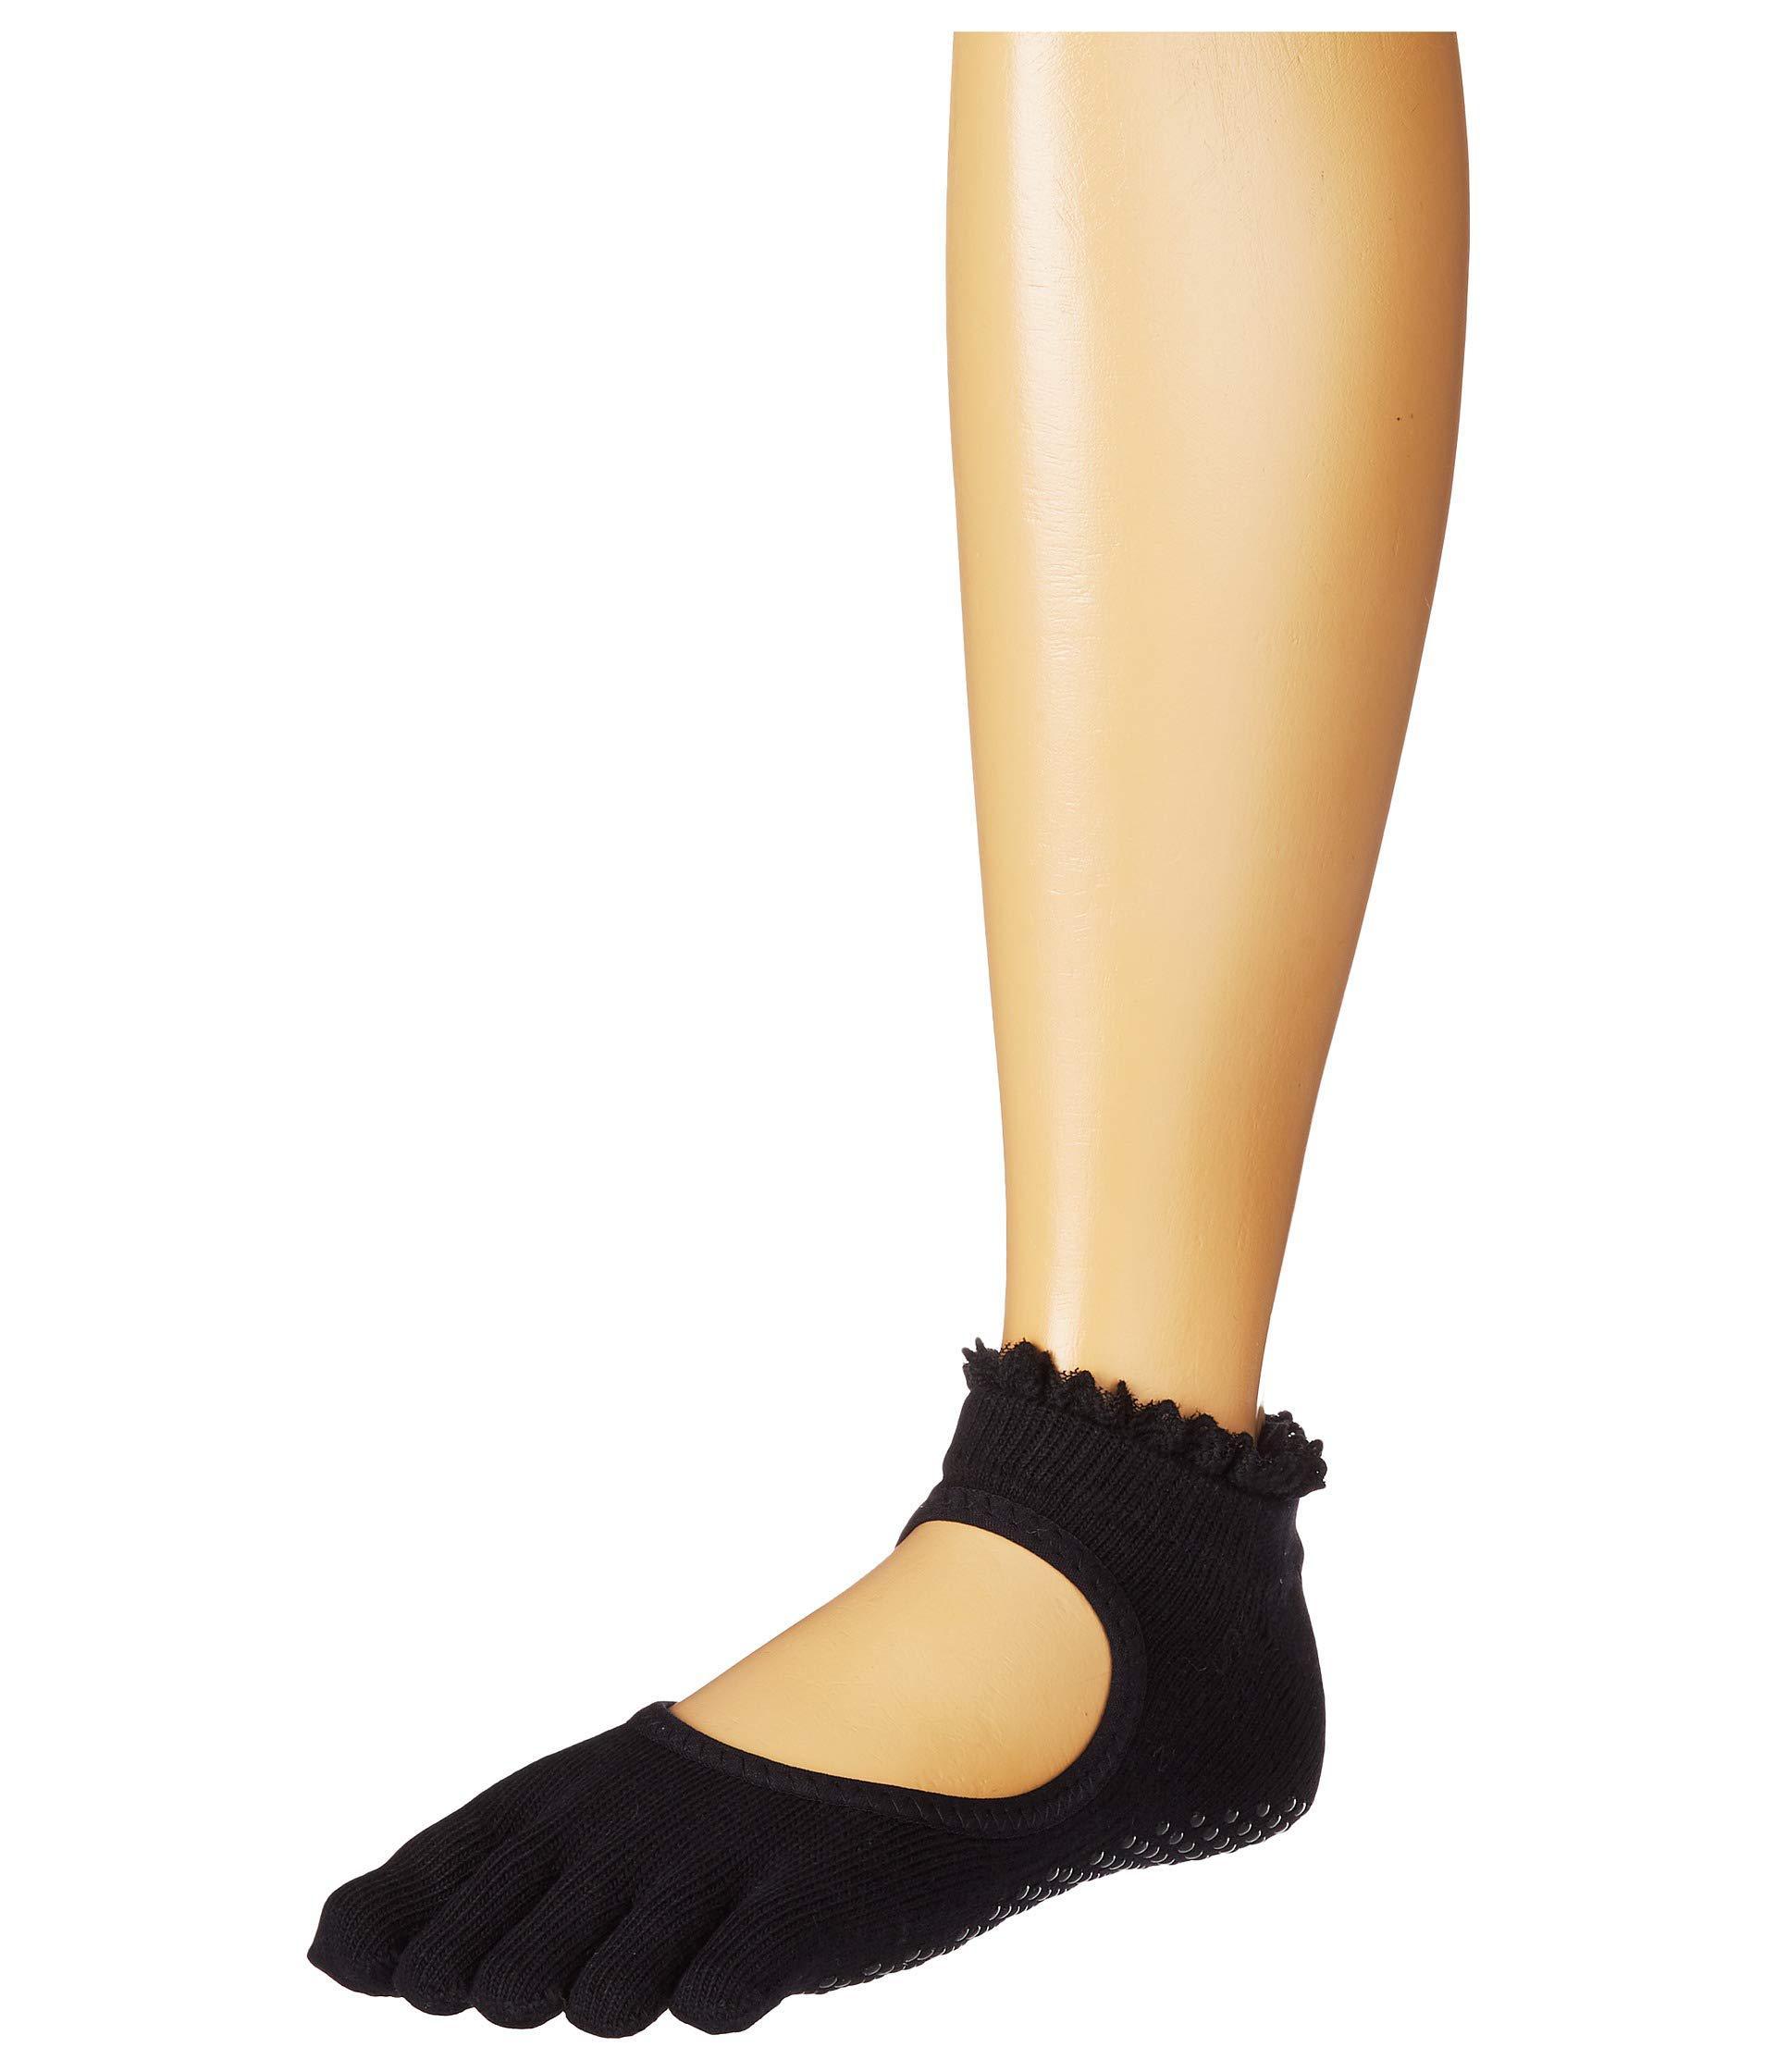 6c1ce7396 Lyst - ToeSox Bella Full Toe W/ Grip (midnight Lace) Women's No Show ...